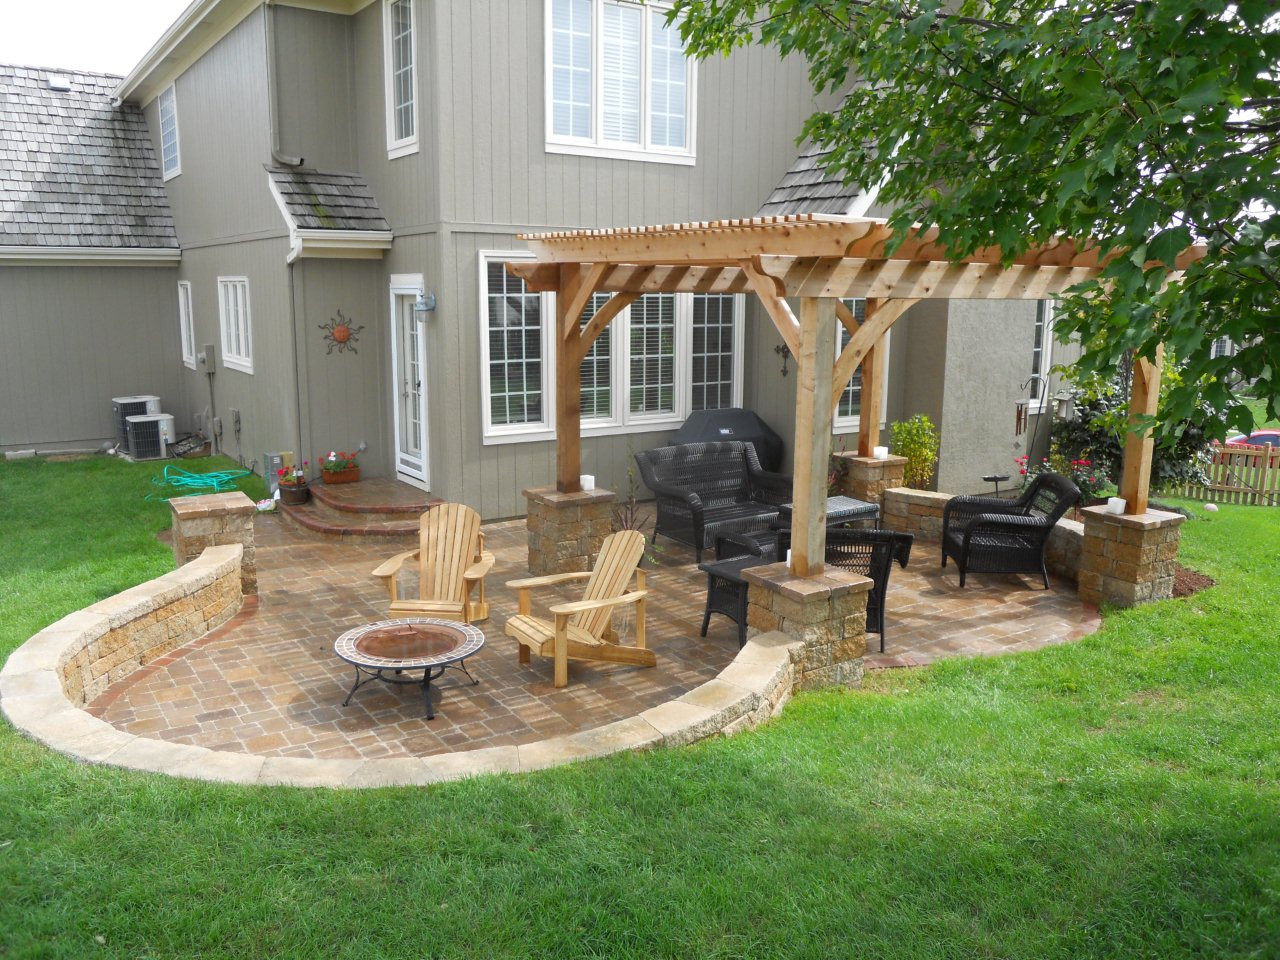 Backyard Patio Paver Design Ideas  Flagstone Patio Pavers Design Ideas For Backyard Patio